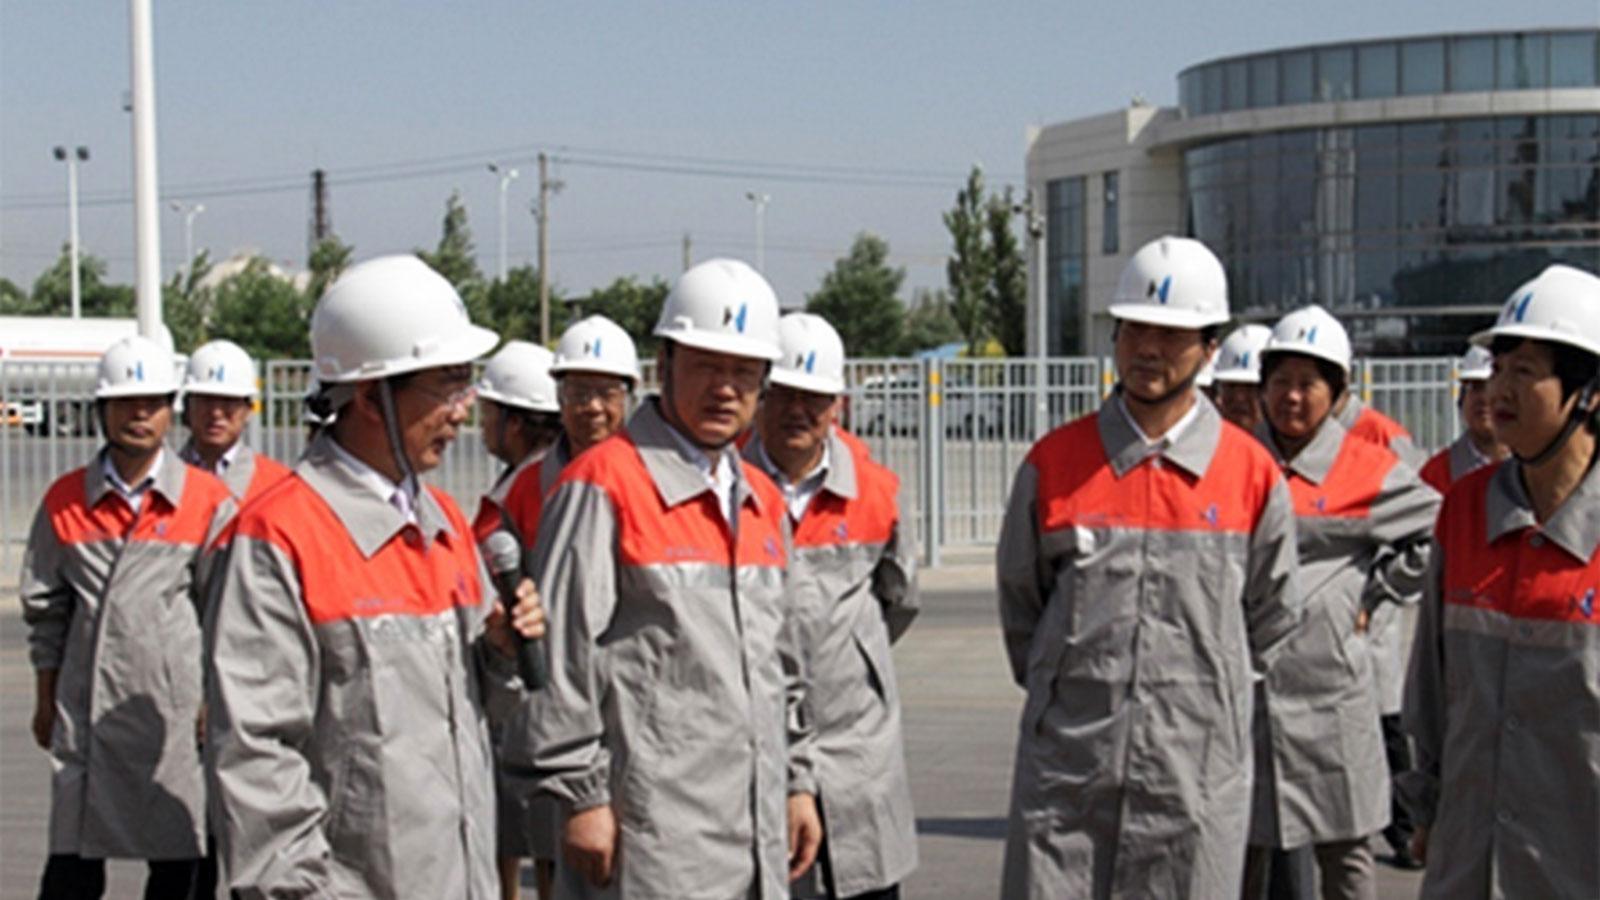 Esteemed visitors to Hanas New Energy in 2014